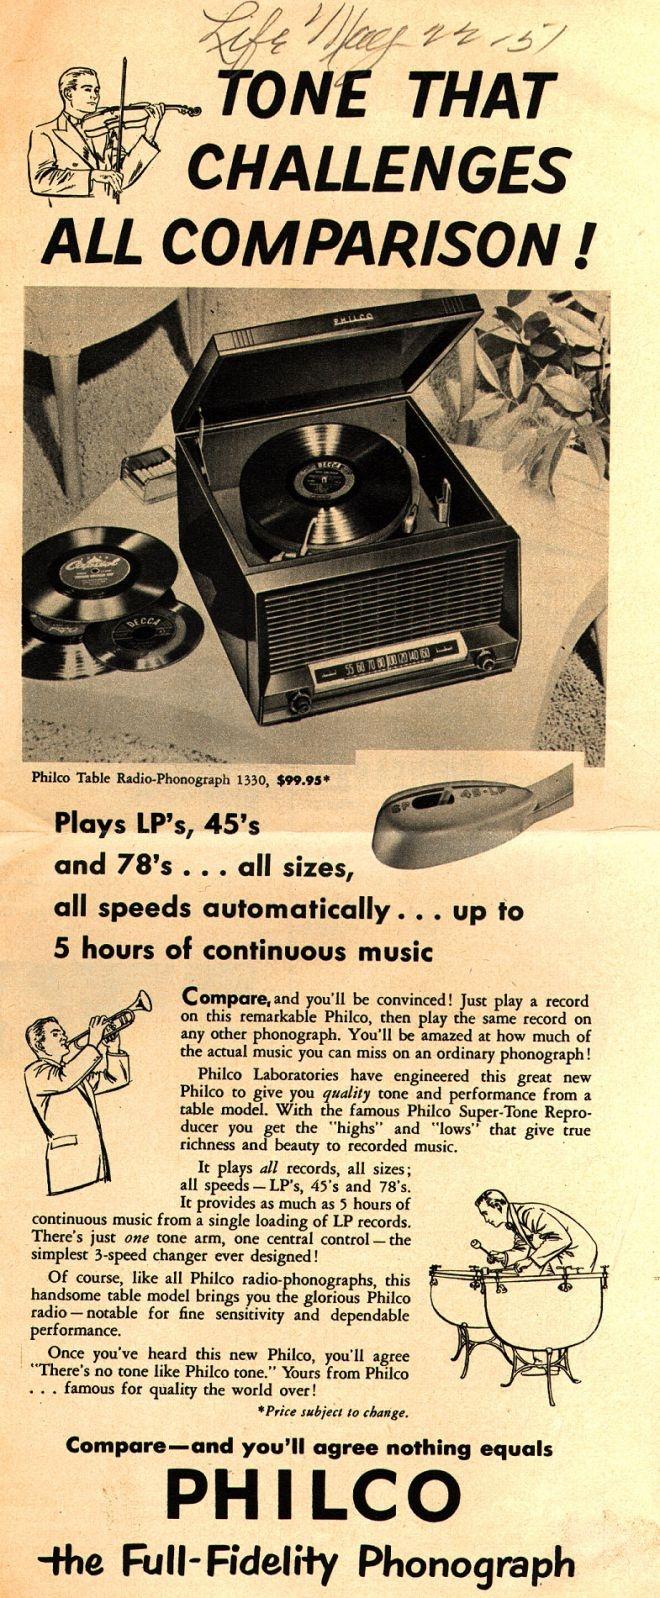 Philco Corporation's Philco Table Radio-Phonograph 1330 – Tone That Challenges All Comparison (1951)